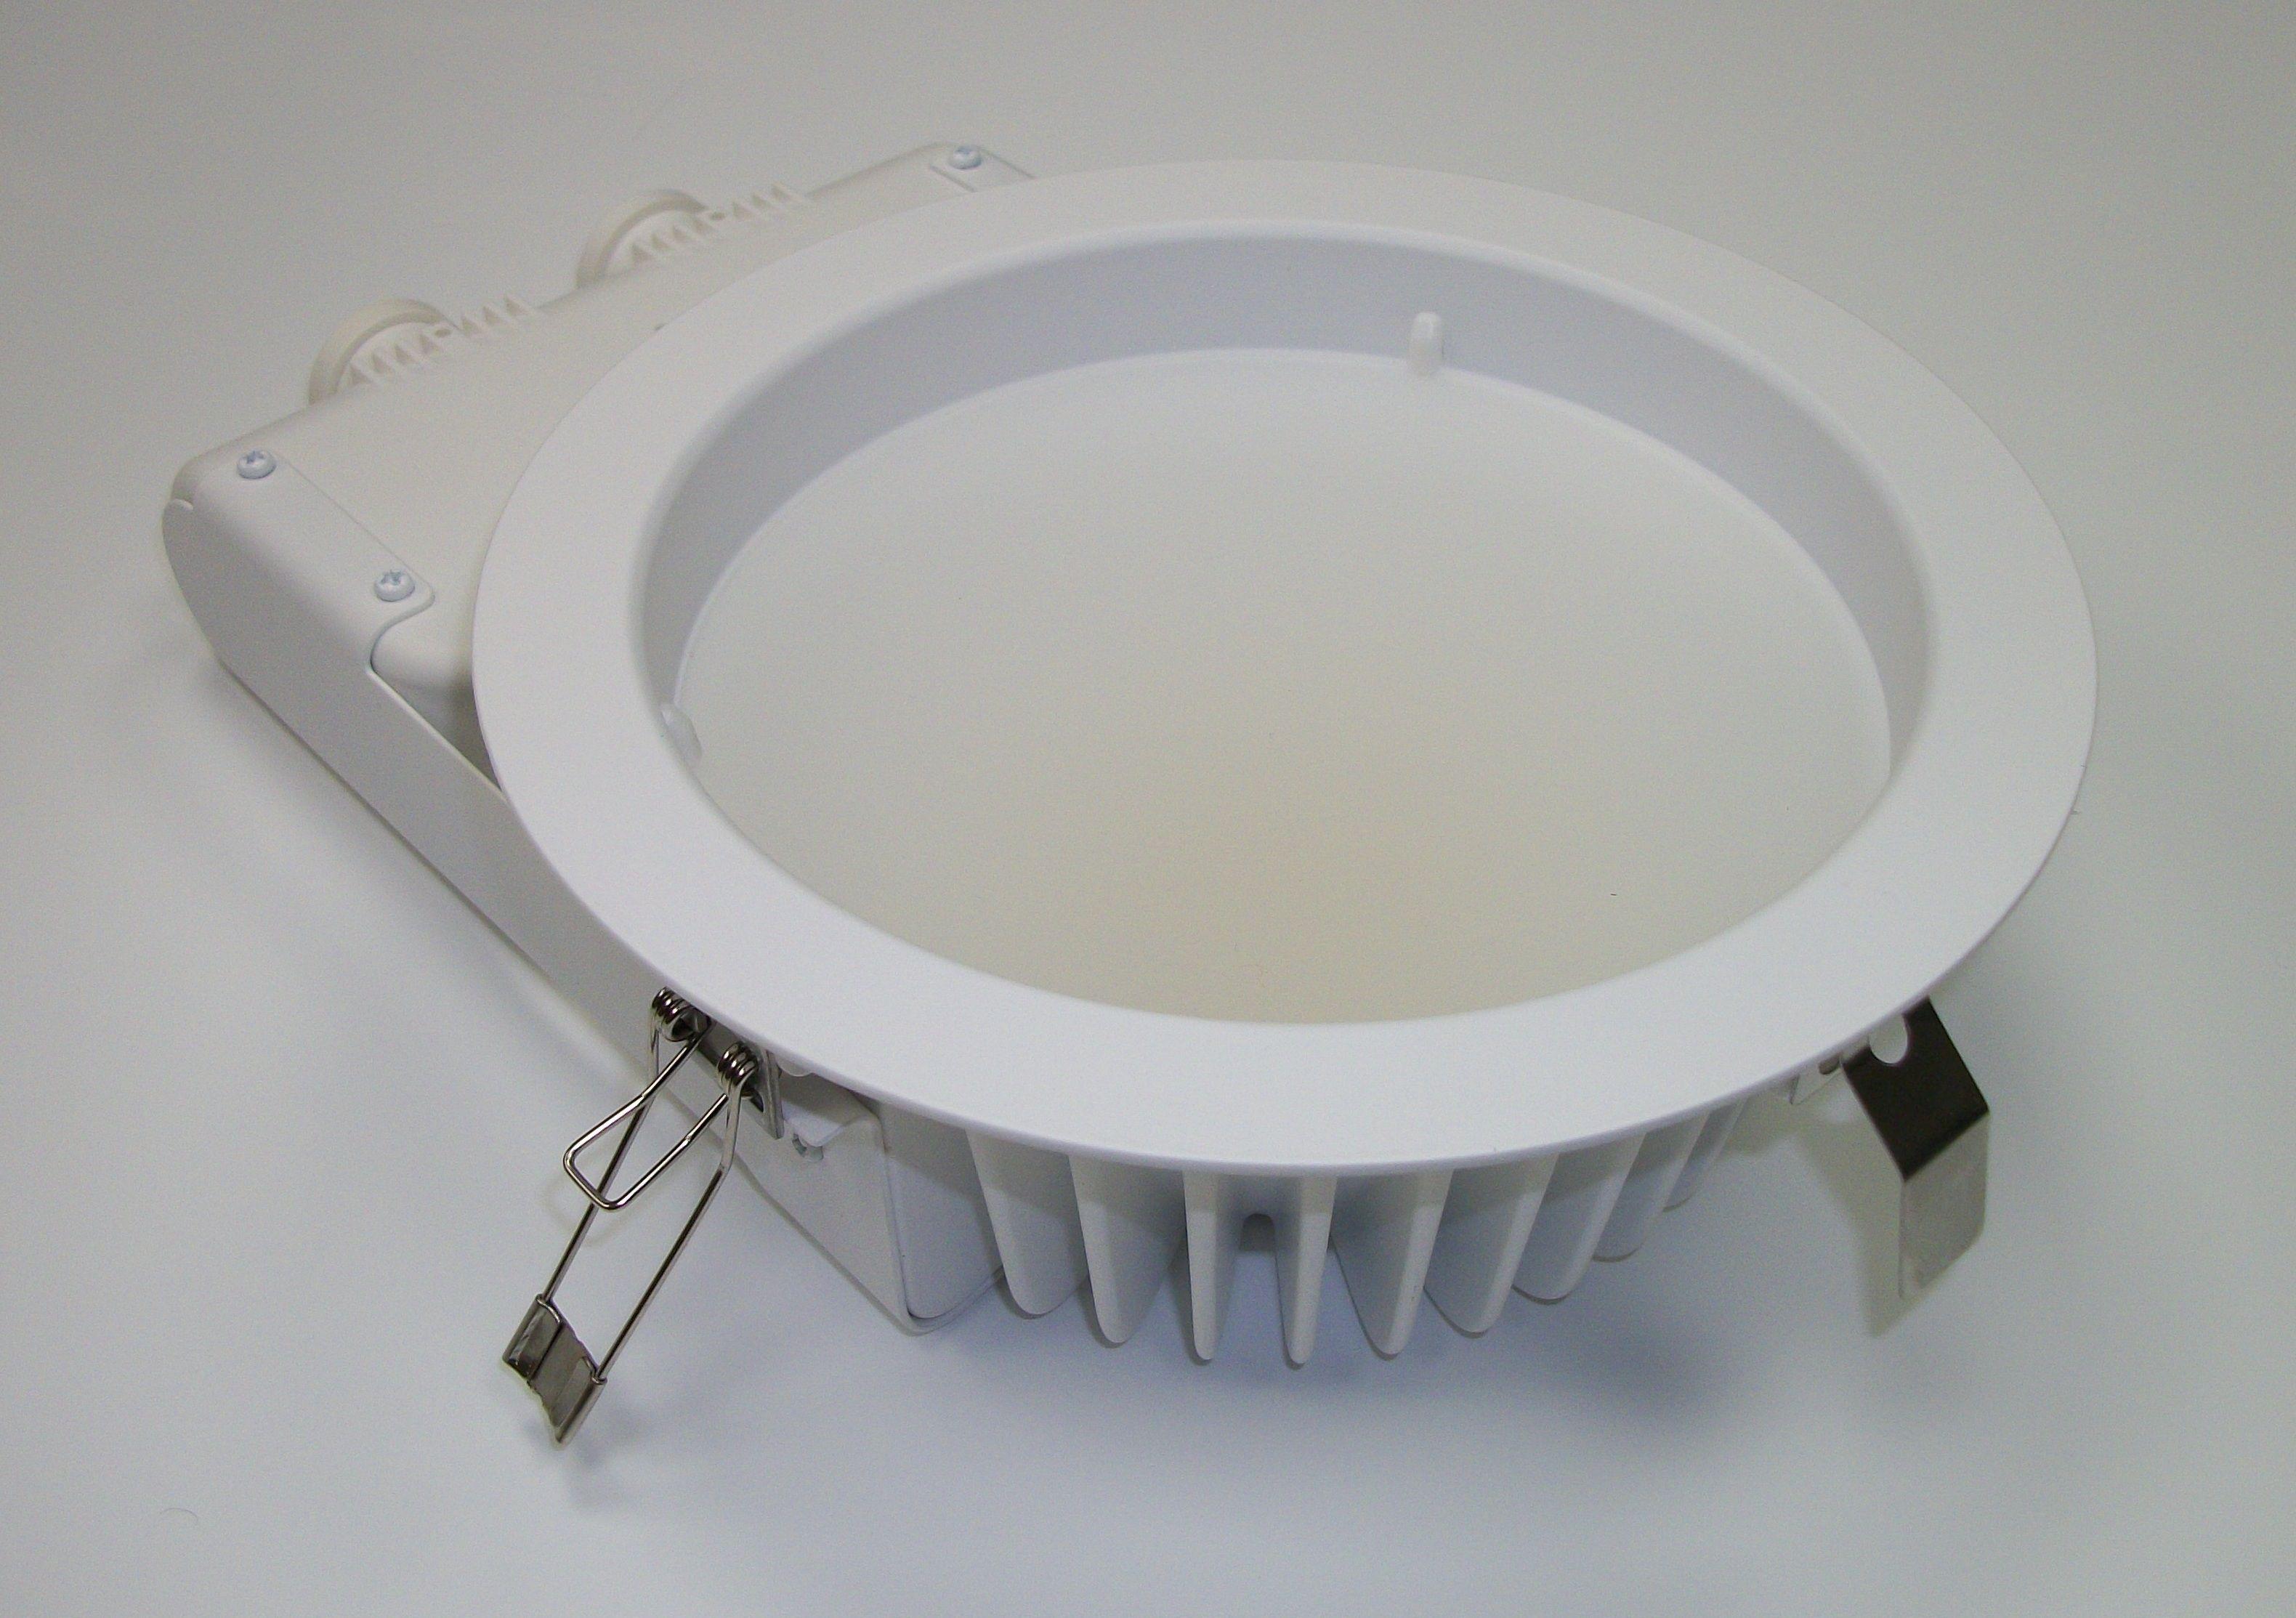 Low Profile Led Recessed Lighting   liminality360.com